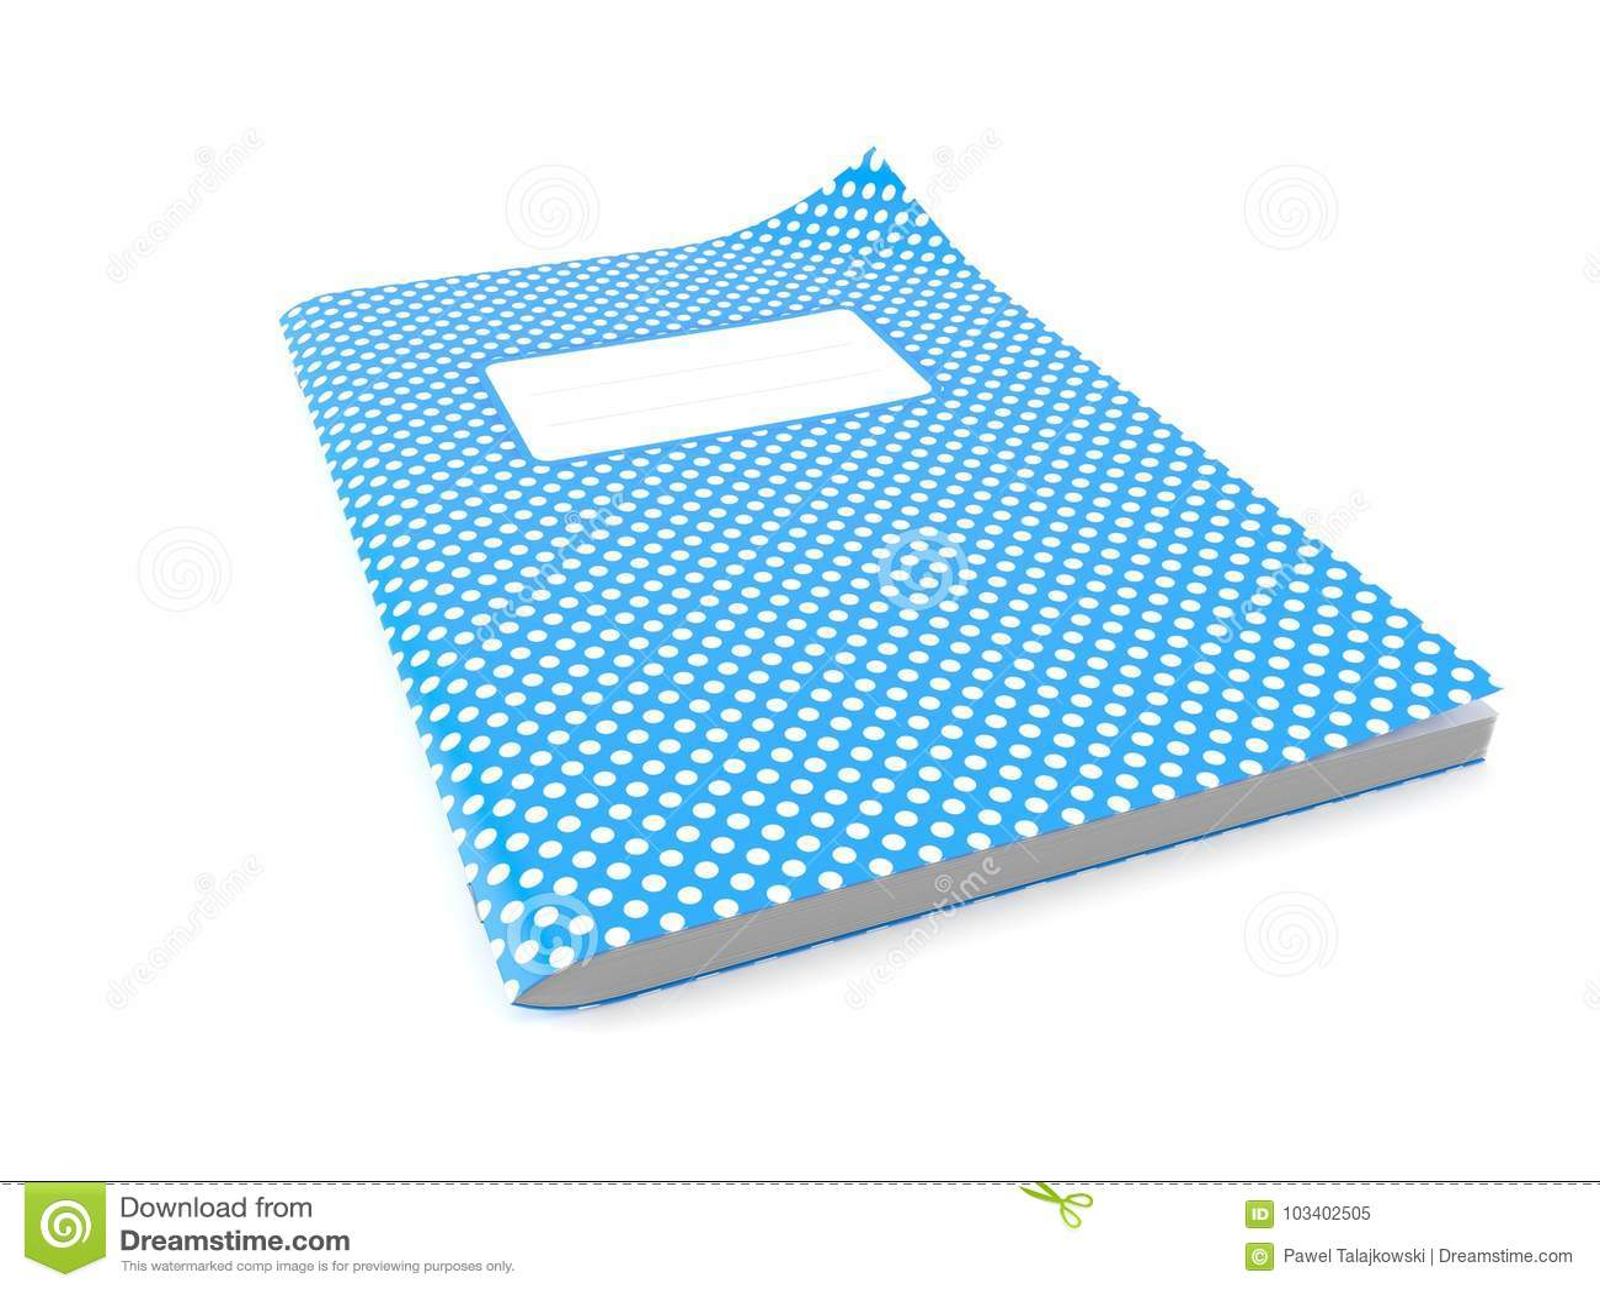 Workbook Stock Illustrations – 2,821 Workbook Stock Illustrations ...